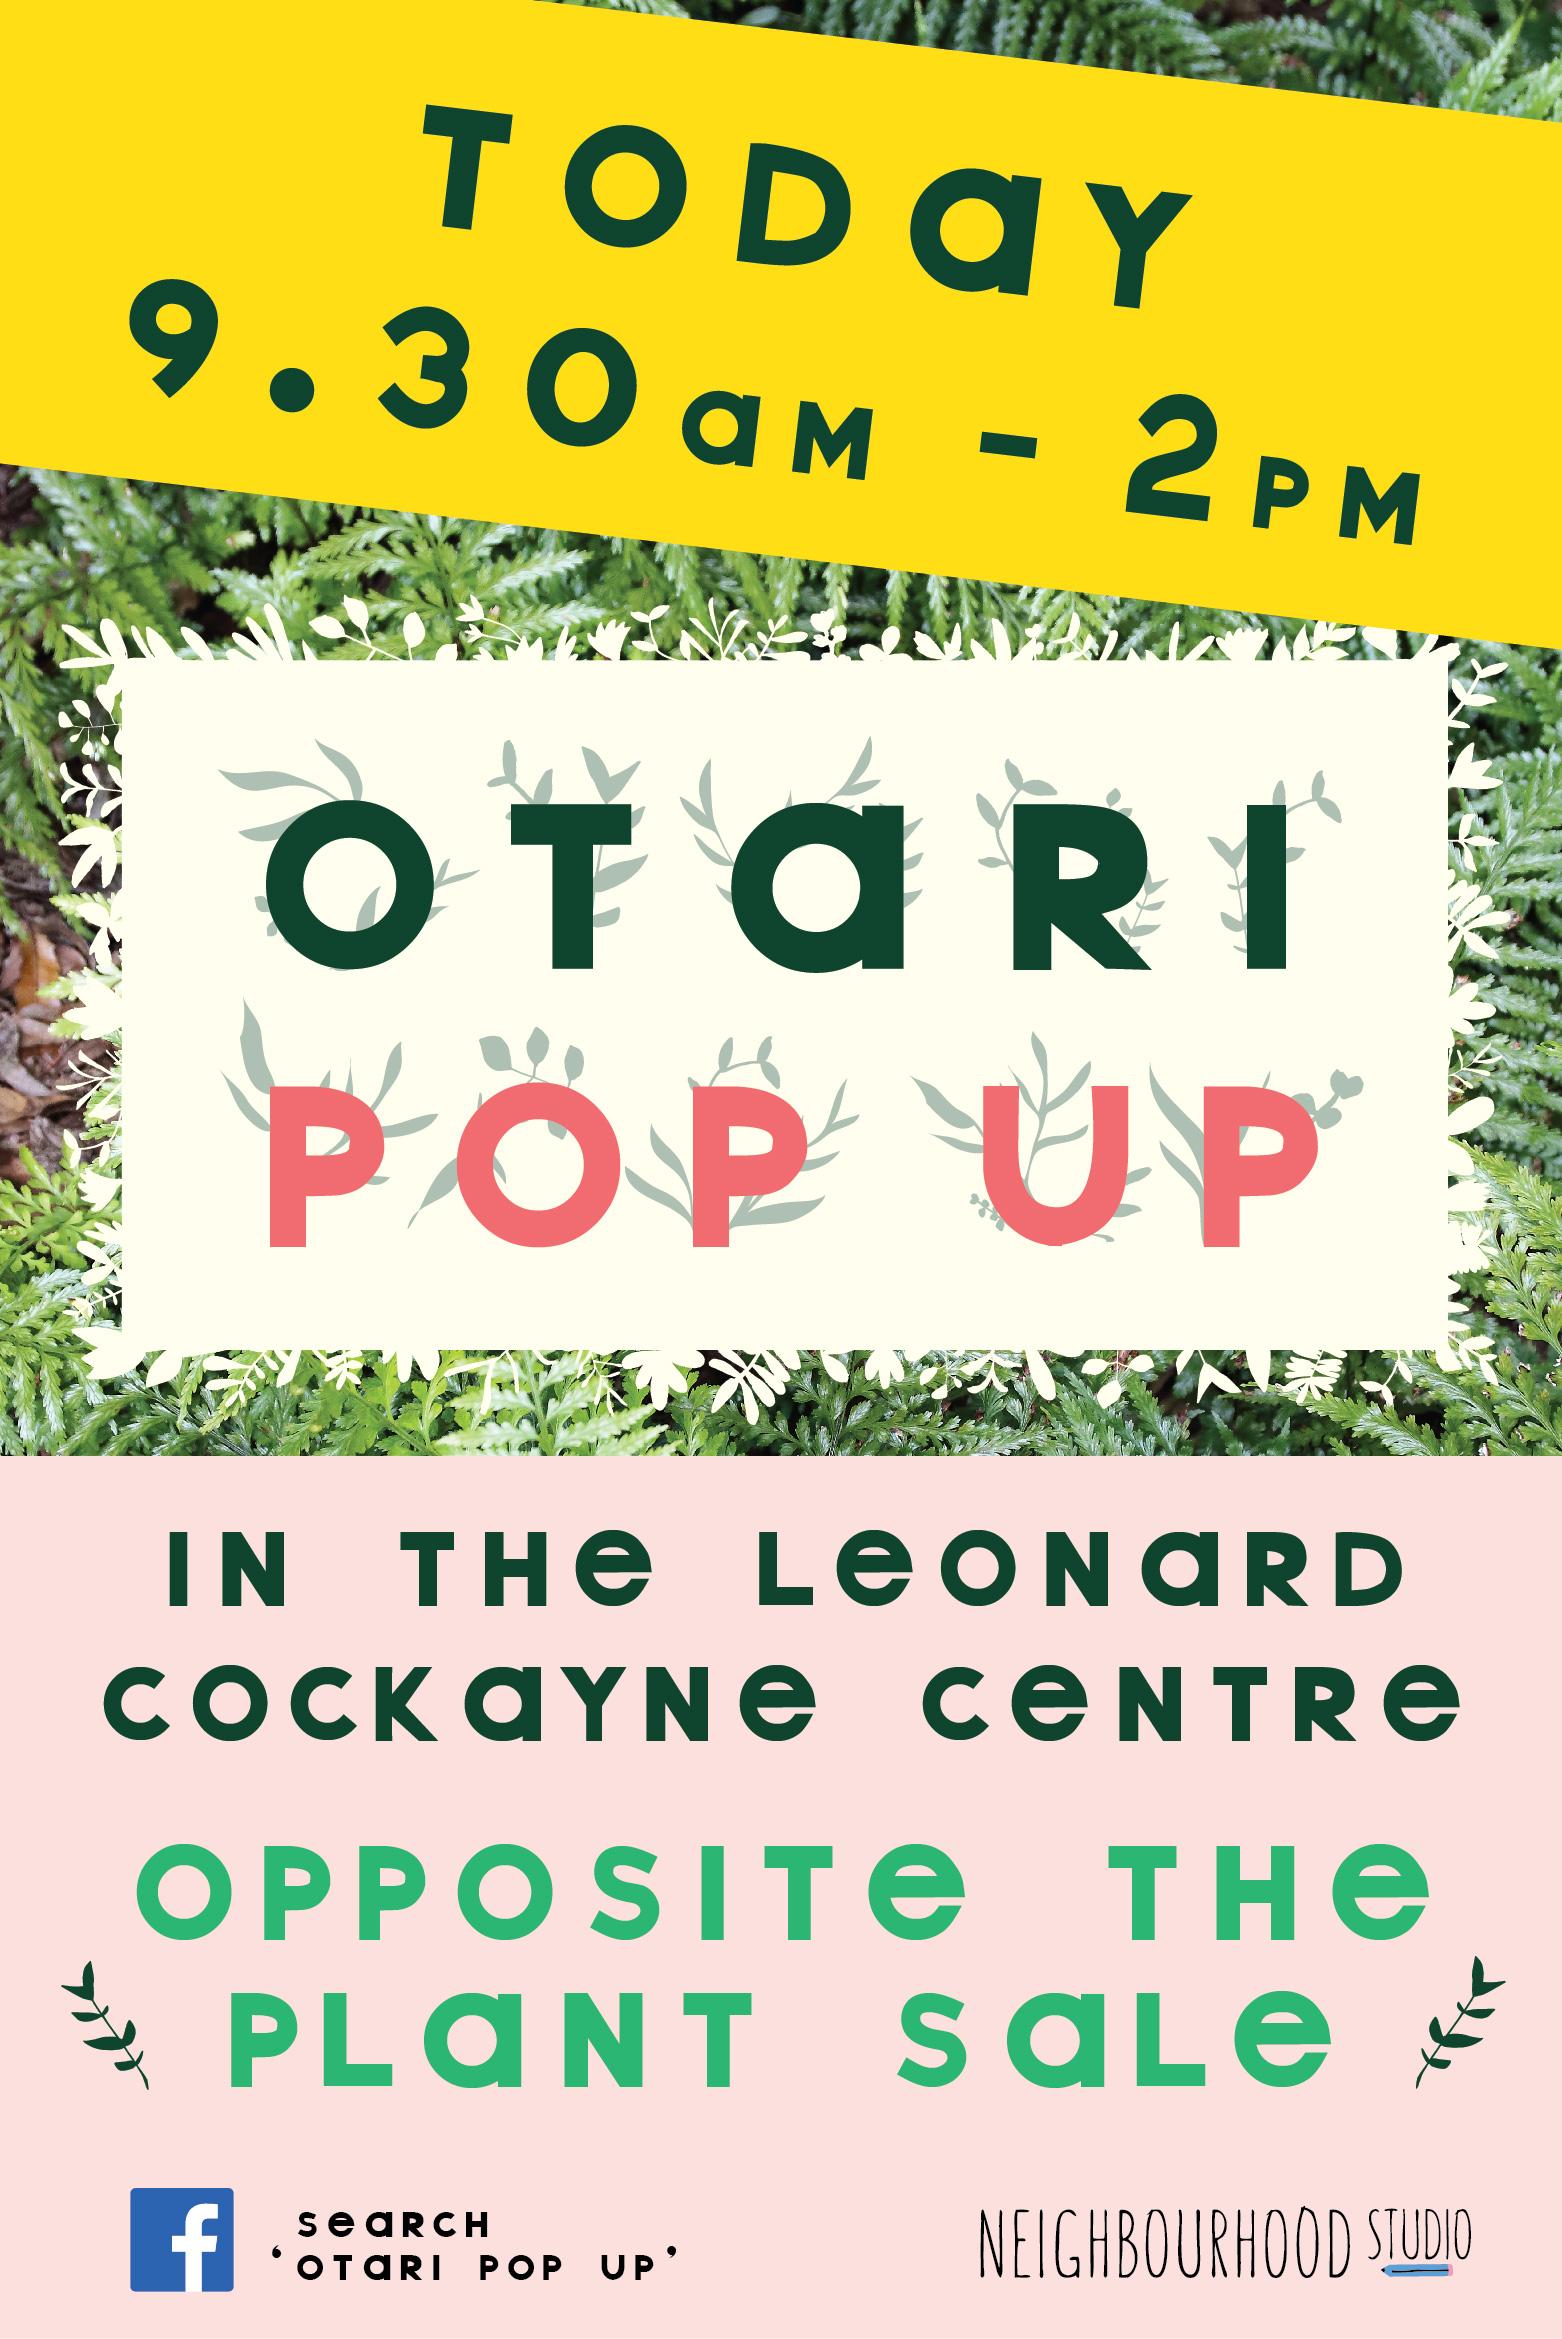 otari pop up today sign-01.jpg